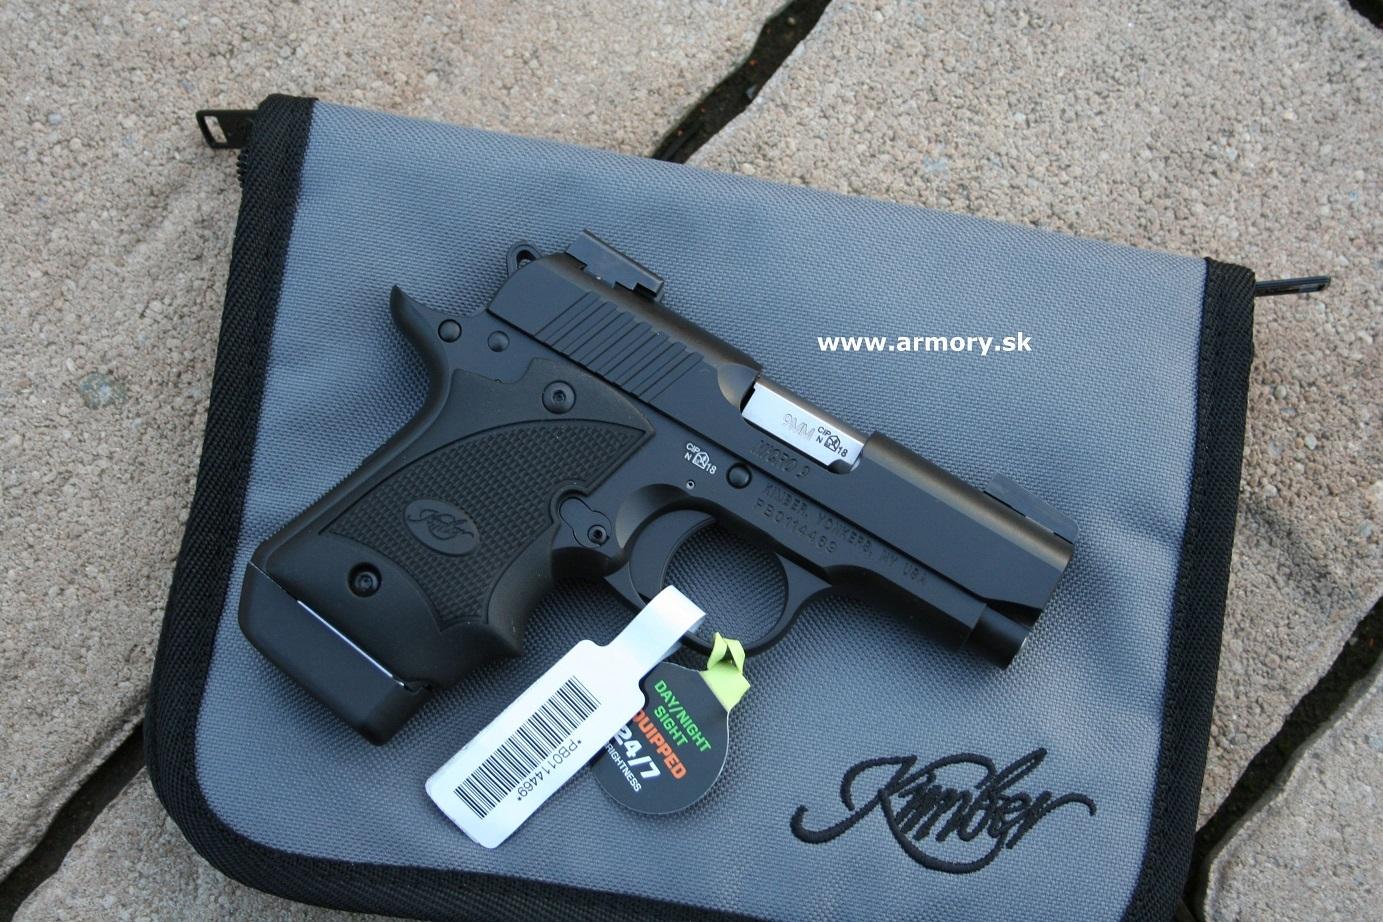 Kimber Micro 9 Nightfall DN - Guns - lvlarmory com